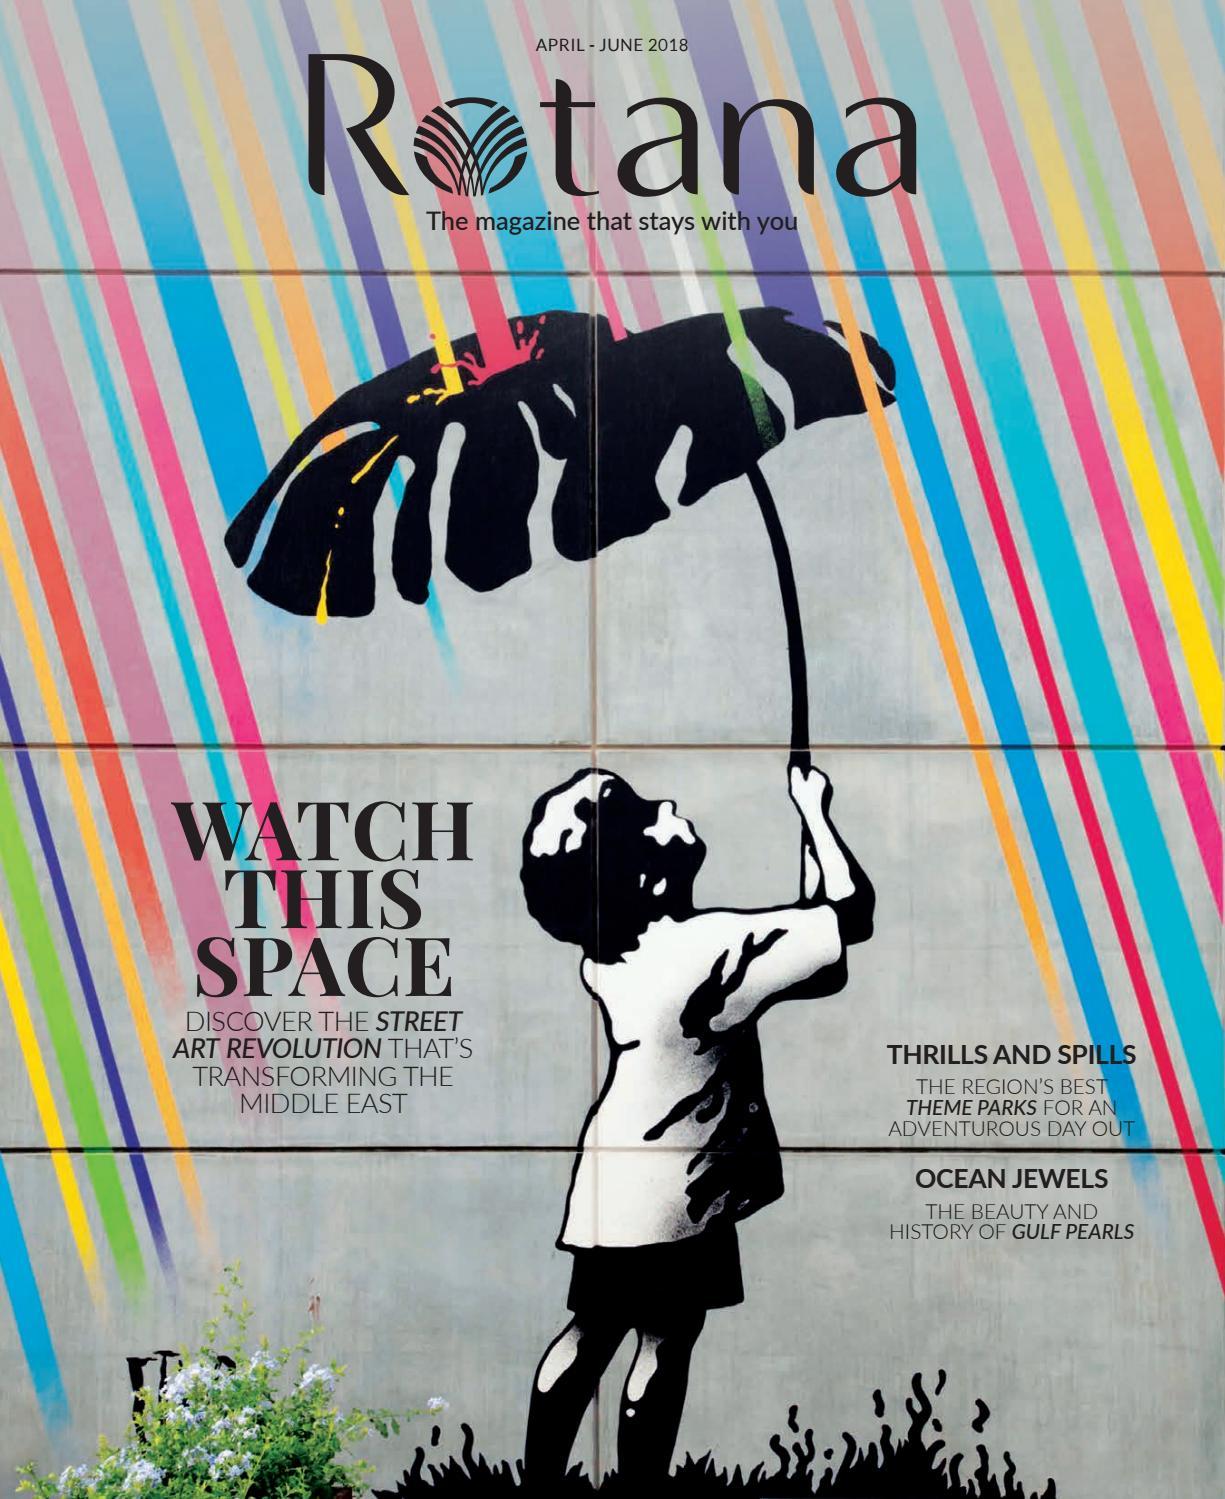 884a9cf86227b Rotana April-June 2018 by Rotana Magazine - issuu